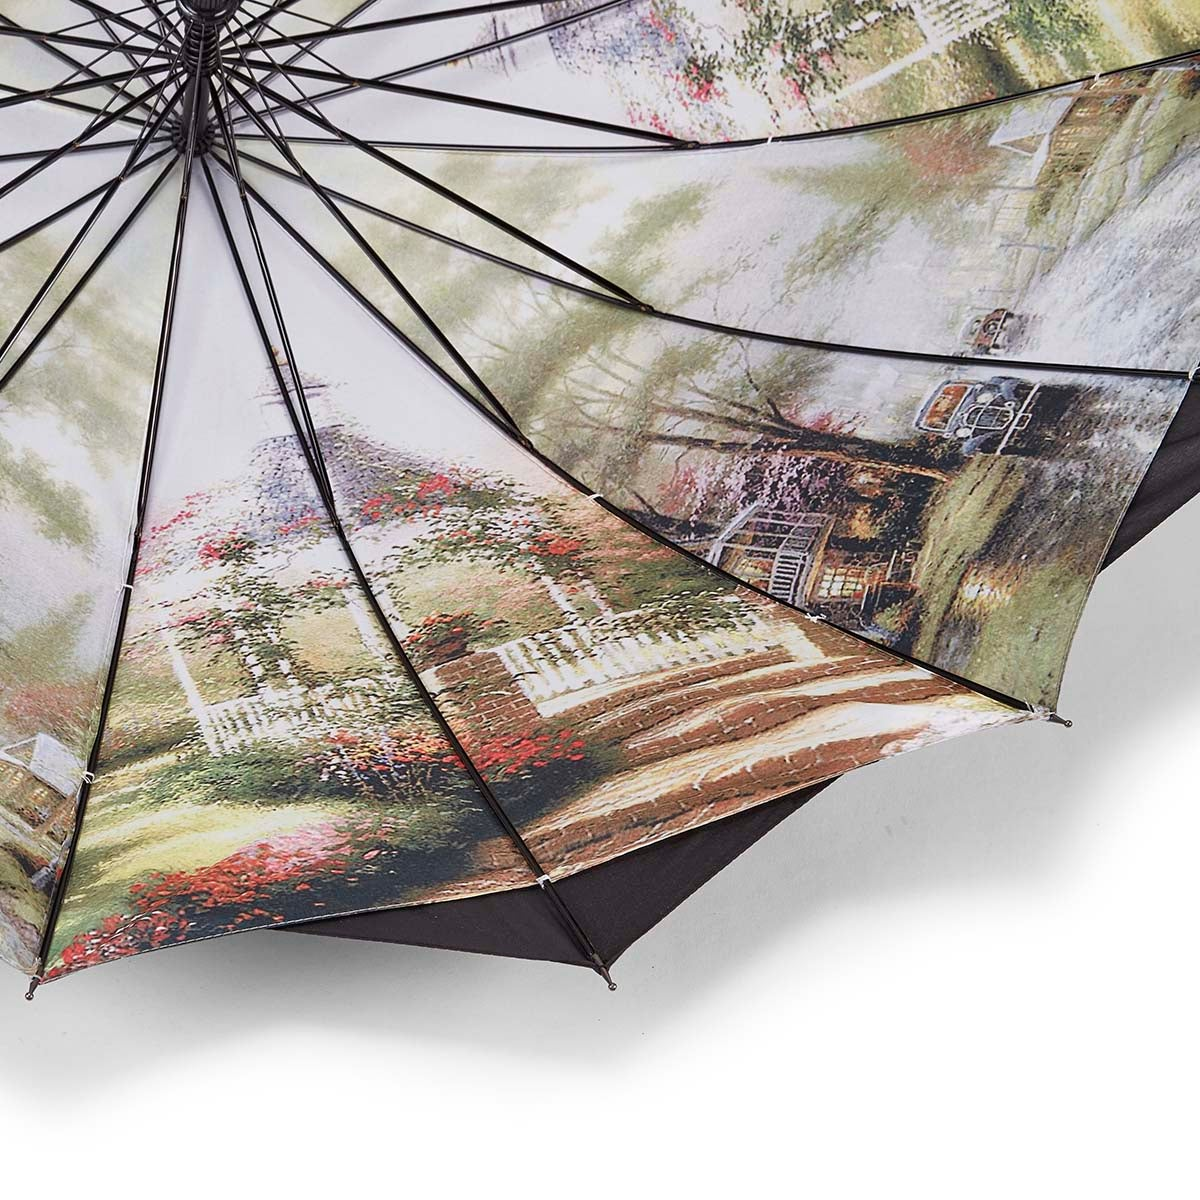 Austin House Panel Stick black umbrella